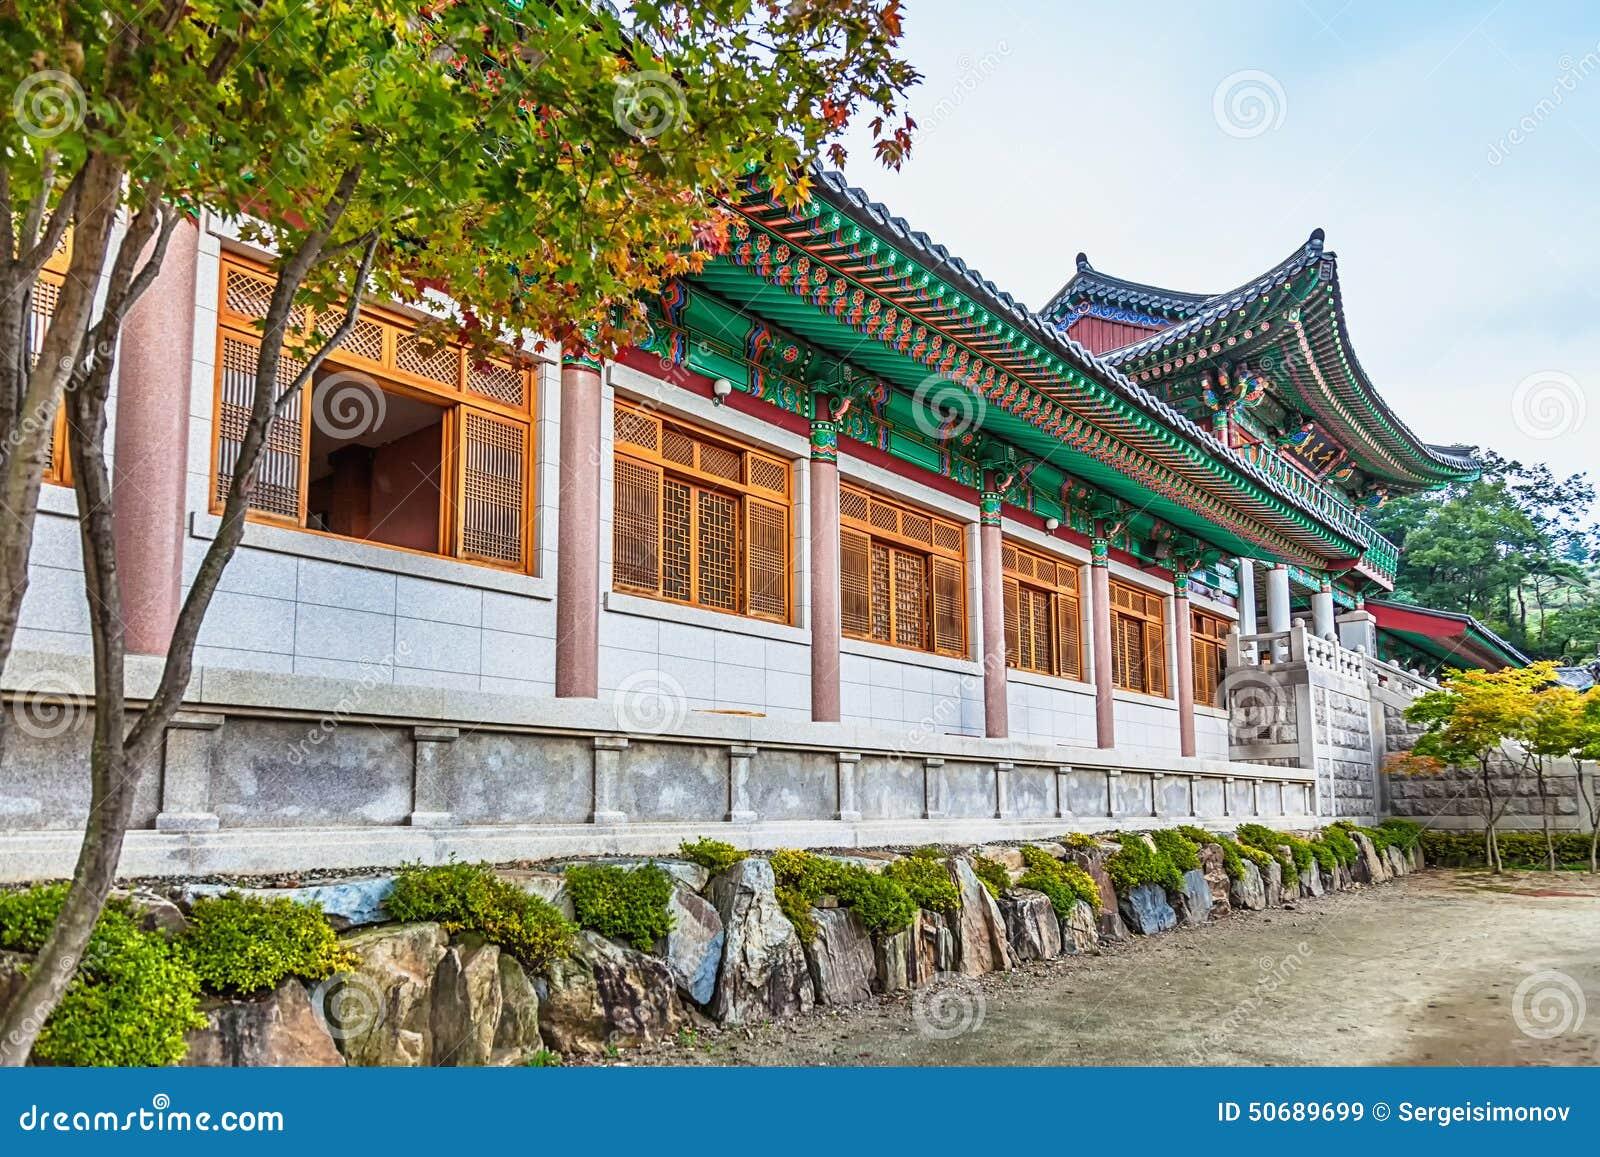 Download 传统建筑学老大厦寺庙在韩国 库存图片. 图片 包括有 寺庙, 反气旋, 镇痛药, 布琼布拉, 绿色, 修士 - 50689699